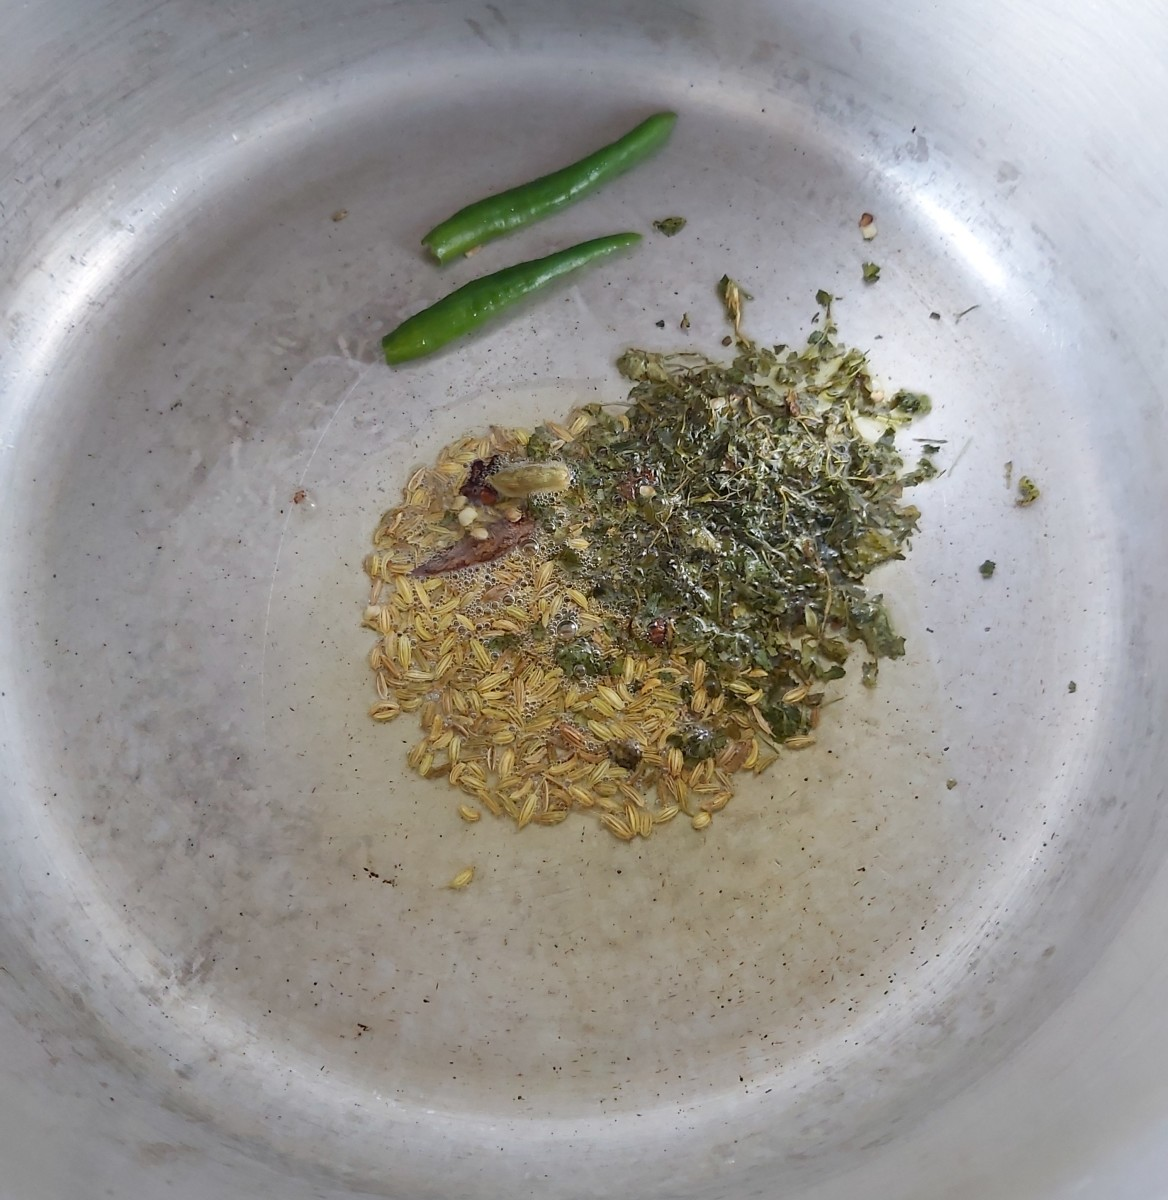 Add 1 teaspoon of fennel seeds, 1-2 teaspoons of kasuri methi or dry fenugreek leaves and 1-2 slit green chilies. Fry for a minute.